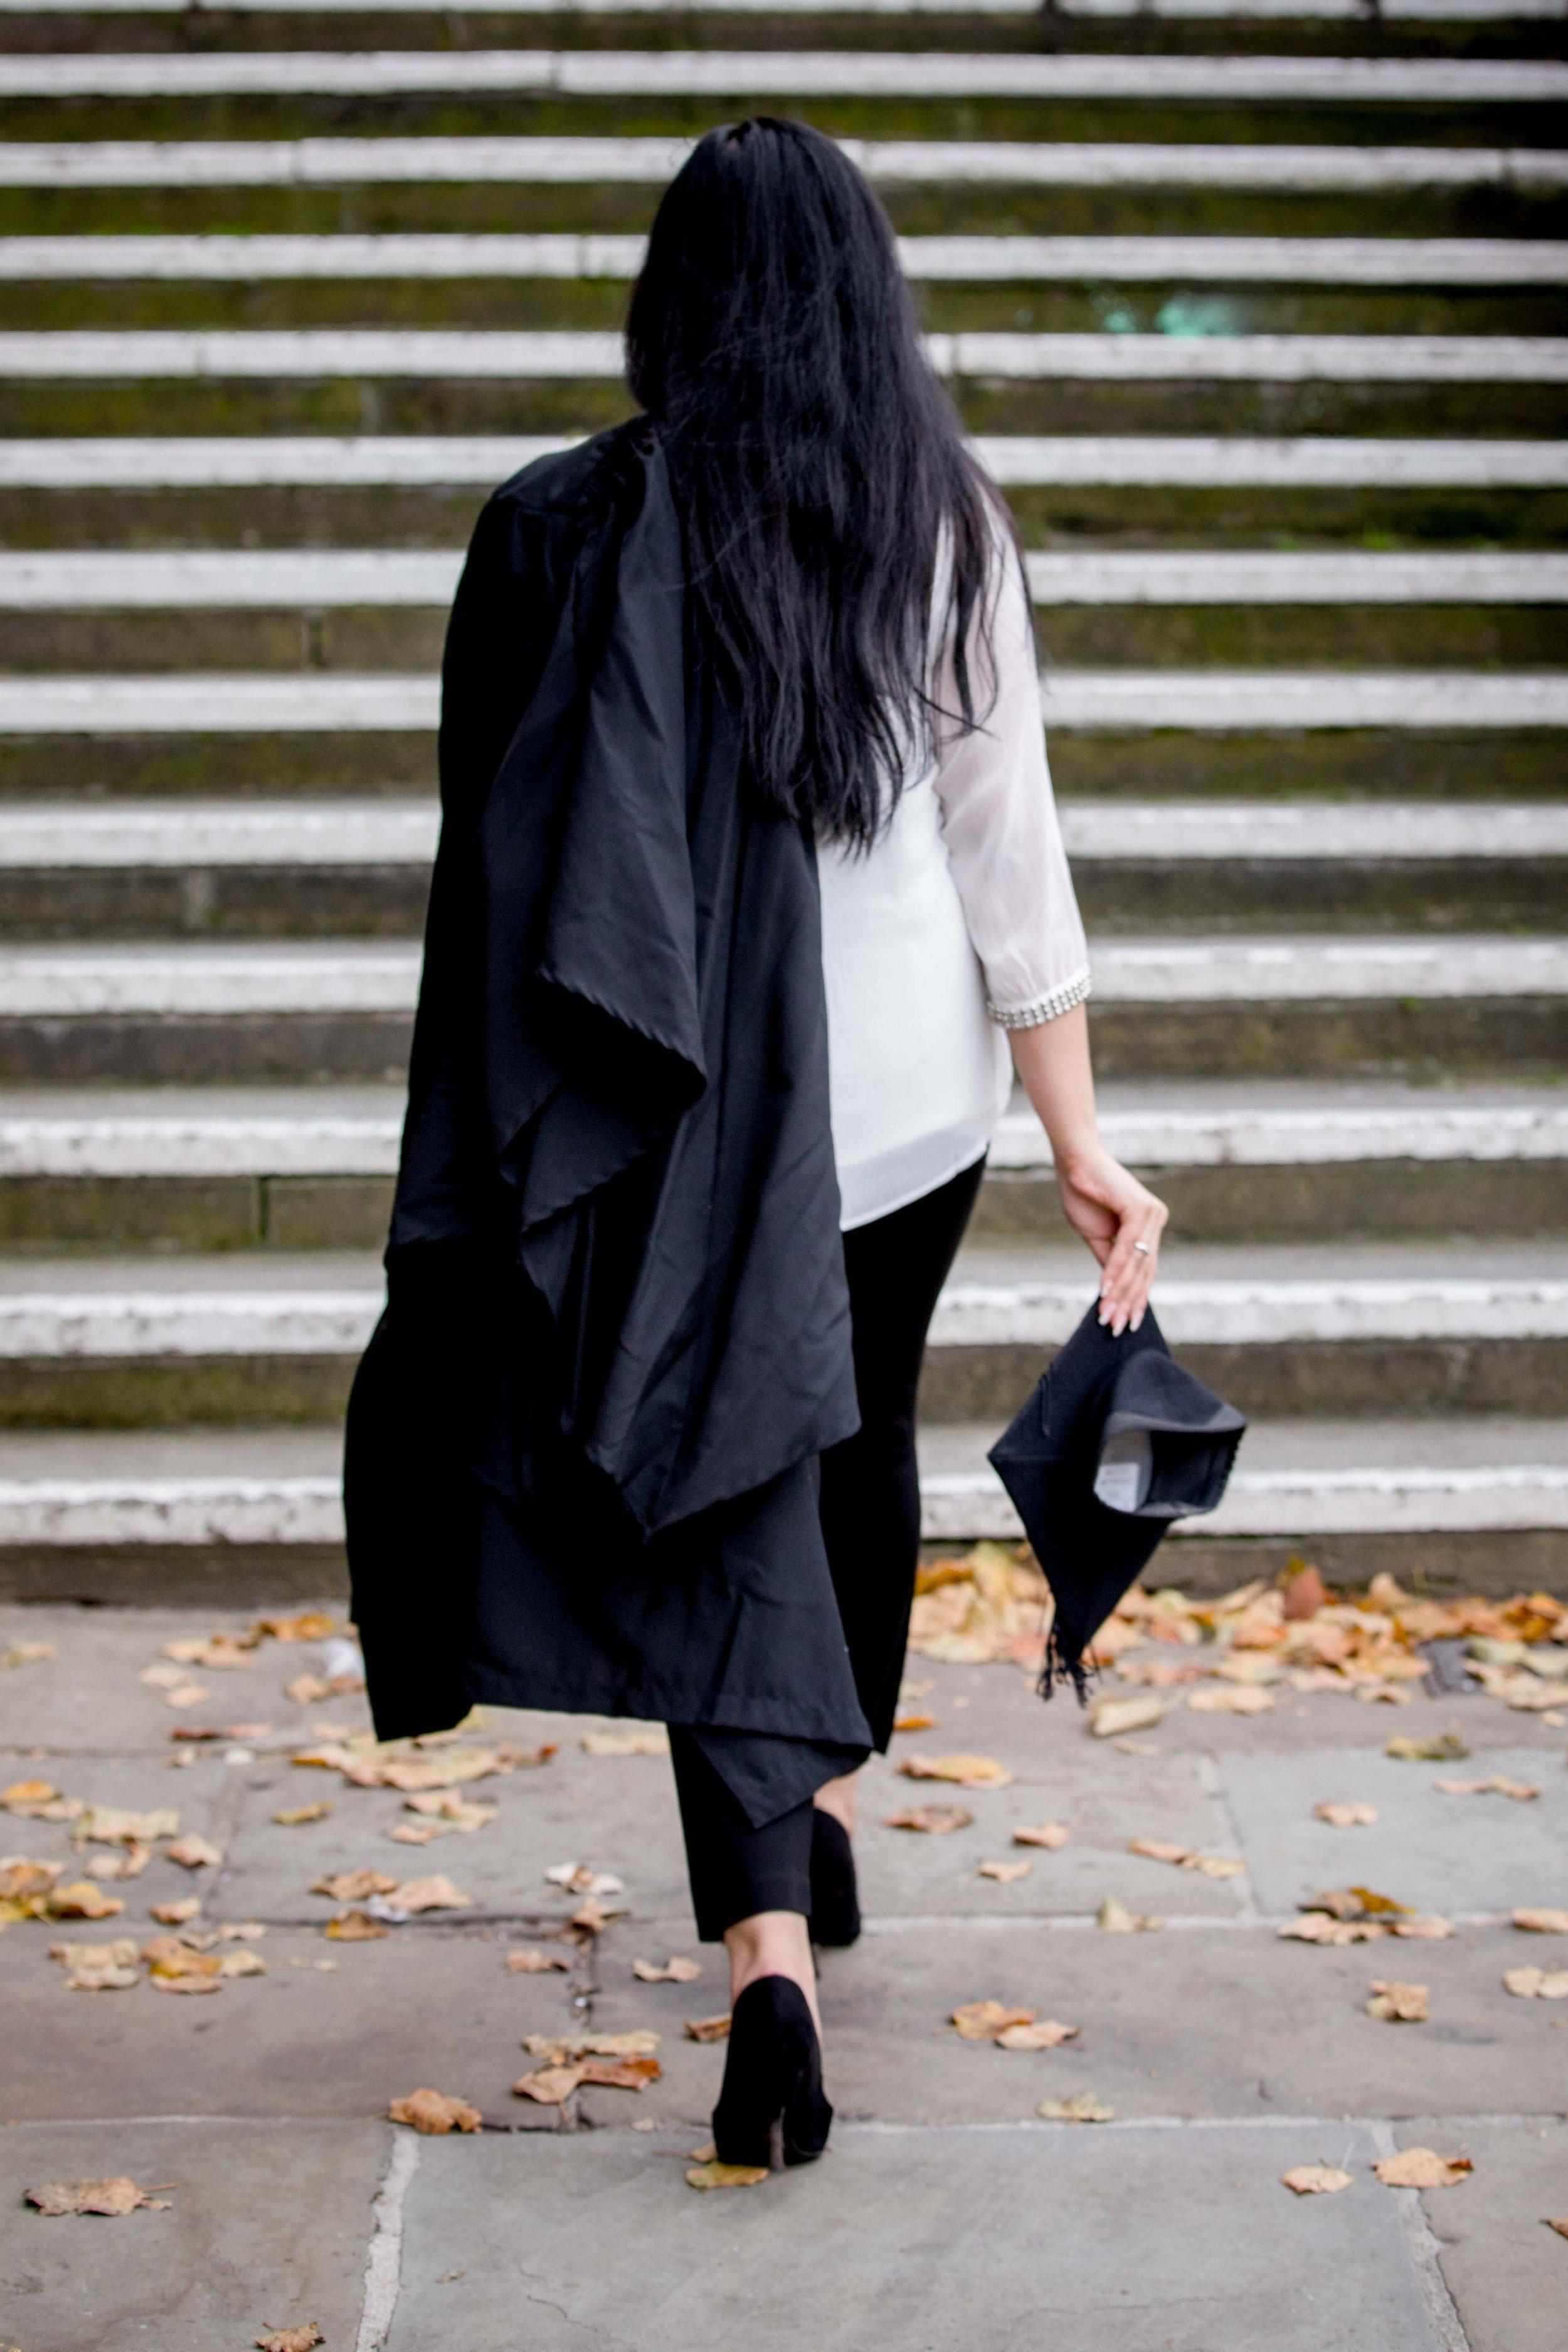 chester-university-graduation-ceremony-photography-photoshoot-graduation-photographer-Bristol-London-Cardiff-Birmingham-Chester-Natalia-smith-photography-9.jpg